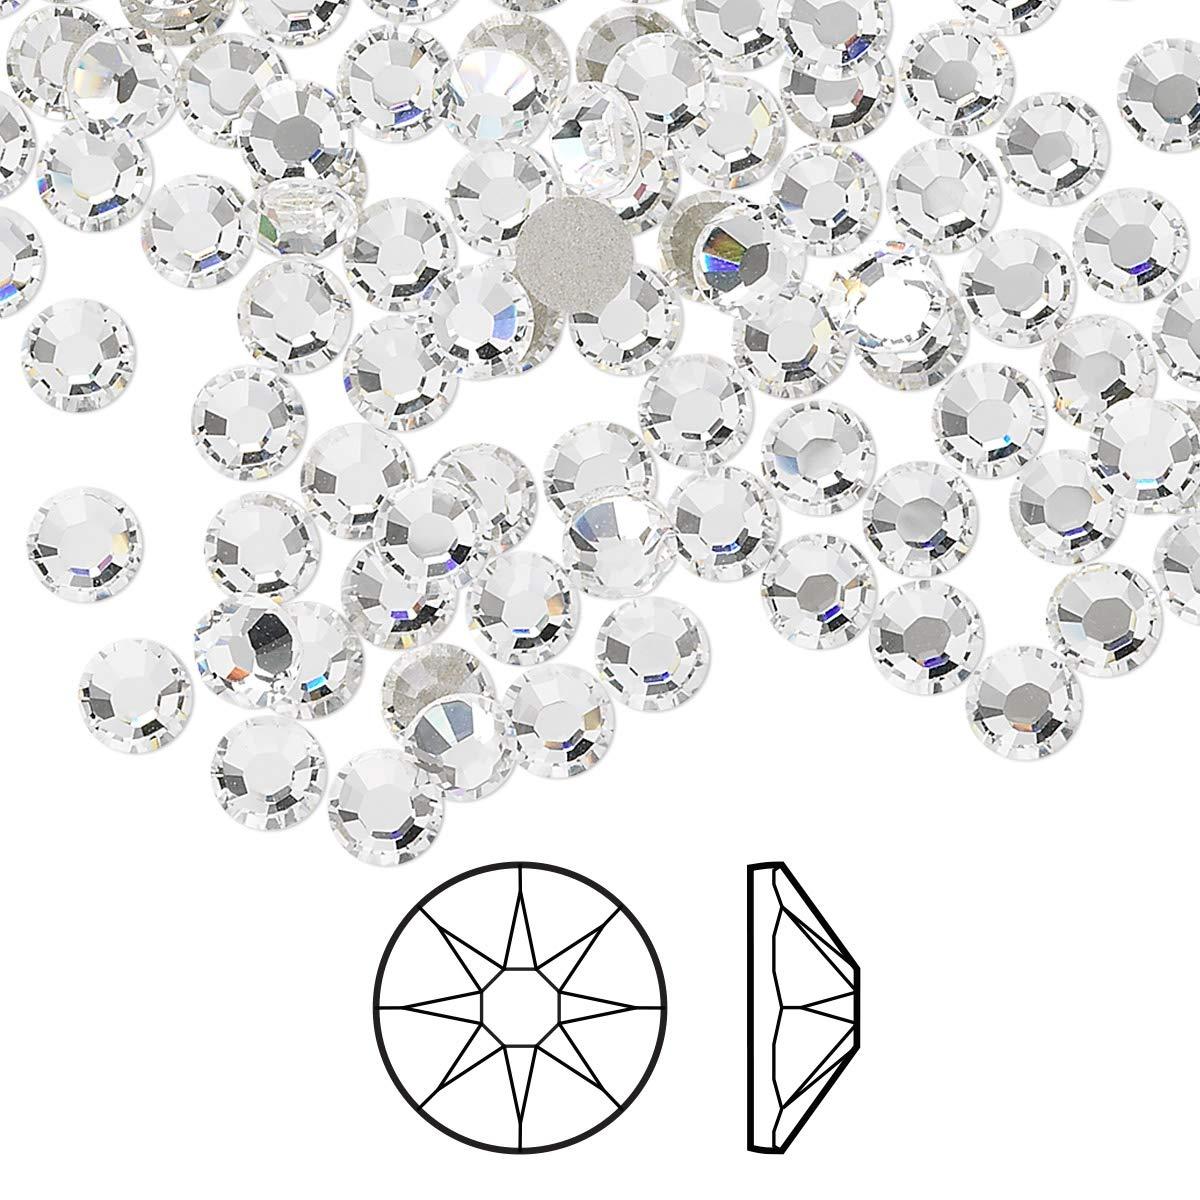 1440 pcs Crystal Clear Flat Back Rhinestones, ss20 4.7mm by Rhinestones Direct